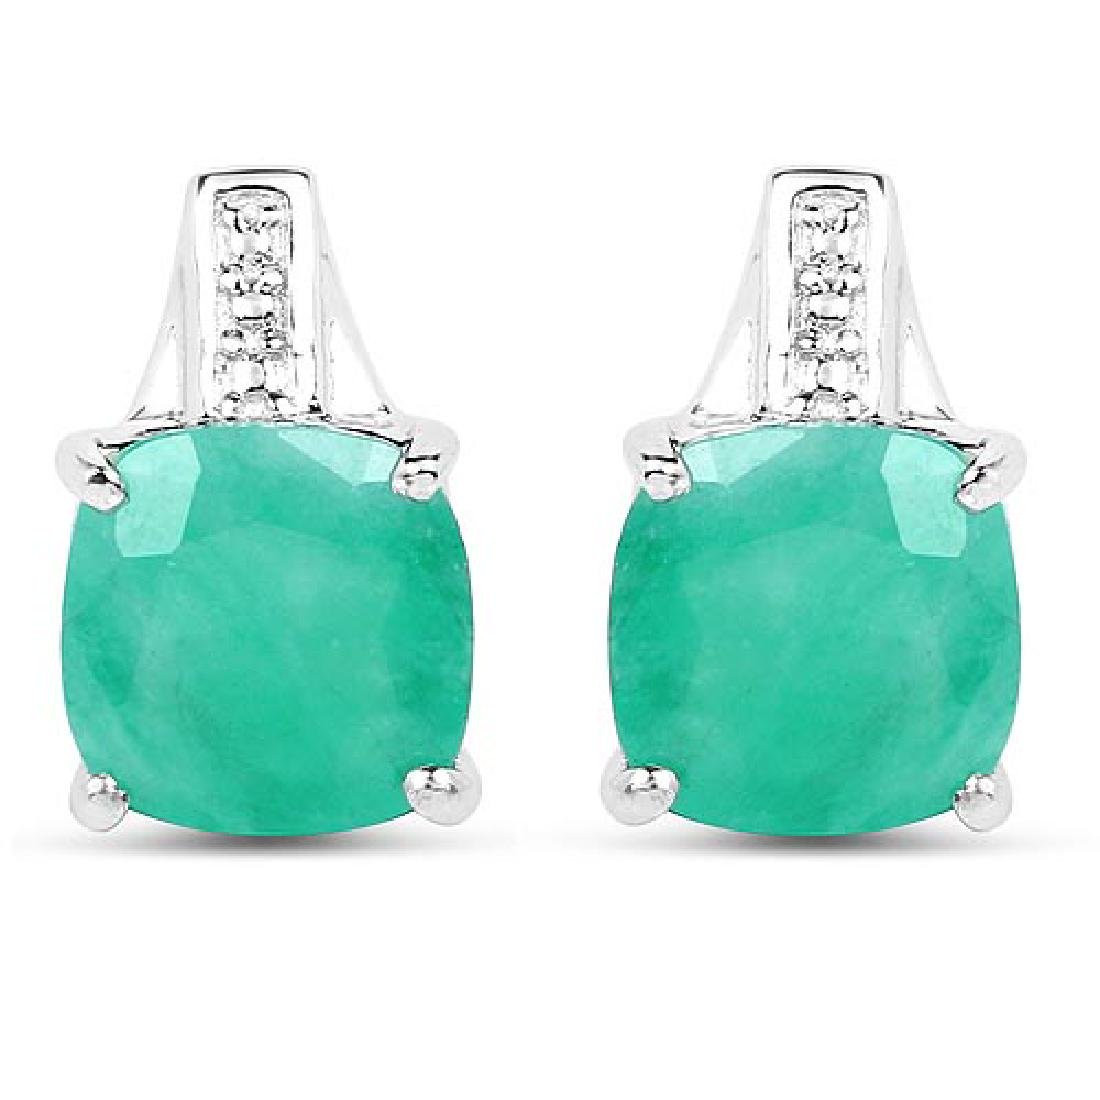 3.20 Carat Genuine Emerald Sterling Silver Earrings